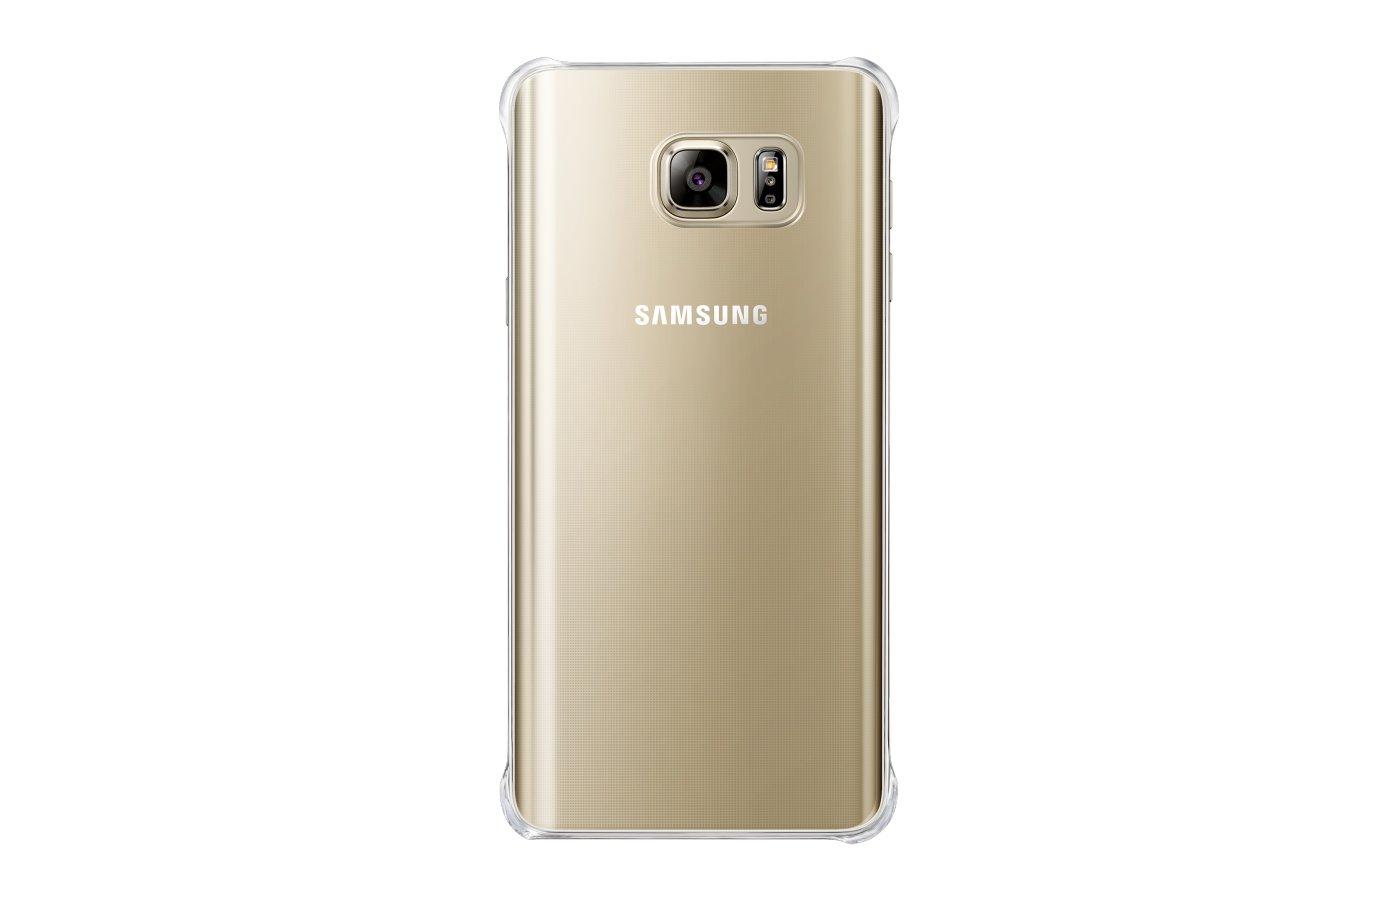 Чехол Samsung GloCover для Galaxy Note 5 (SM-N920) (EF-QN920MFEGRU) gold